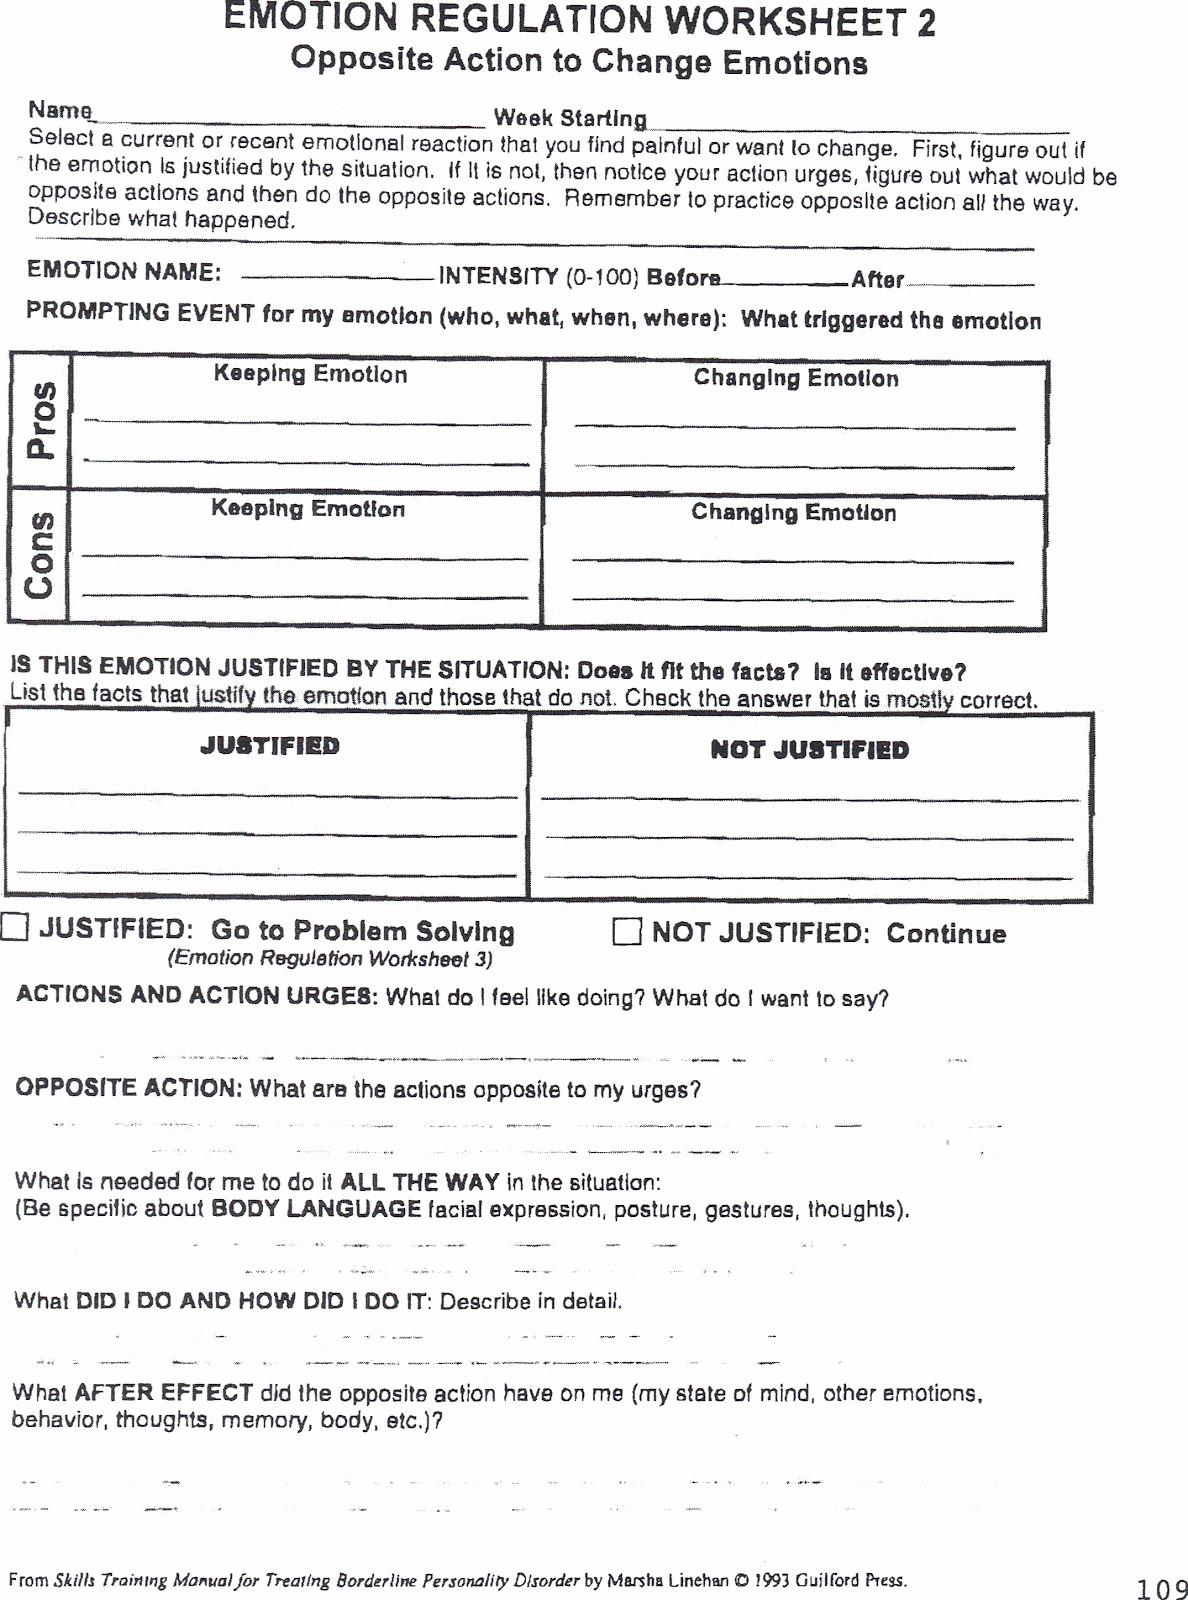 Impulse Control Worksheets Printable Inspirational Impulse Control Worksheets Printable